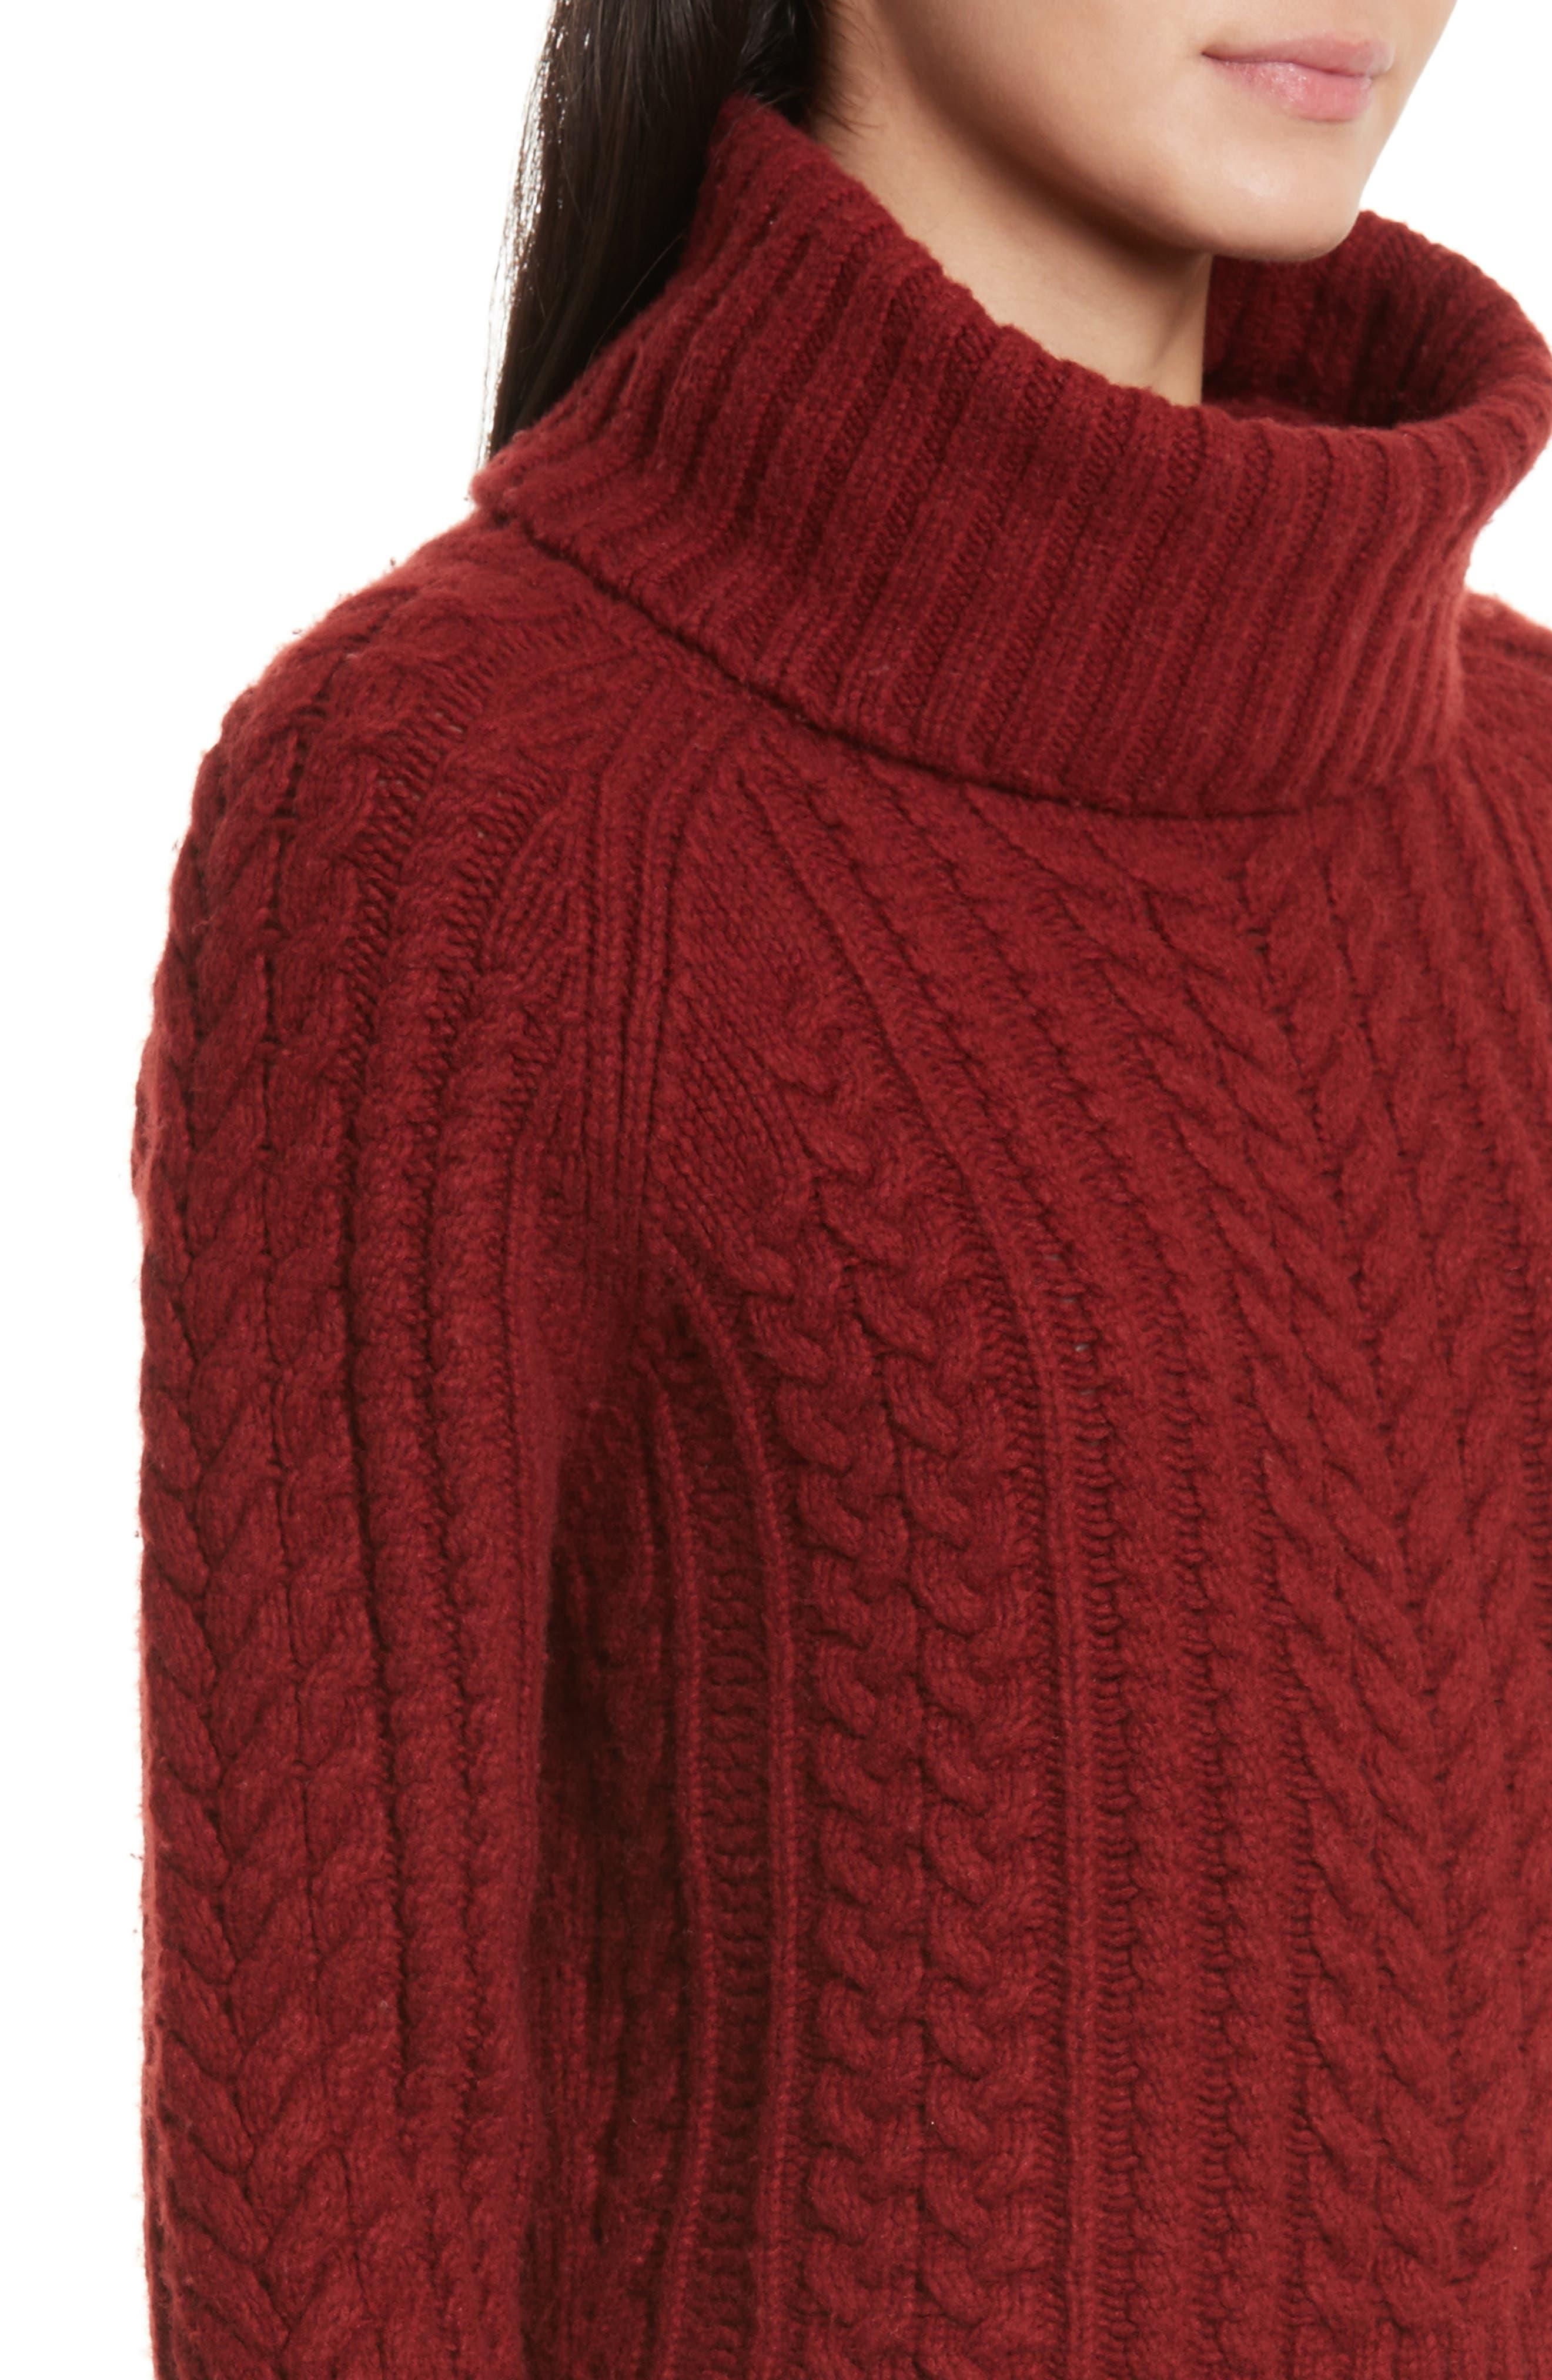 Tobin Cable Knit Crop Turtleneck Sweater,                             Alternate thumbnail 4, color,                             939